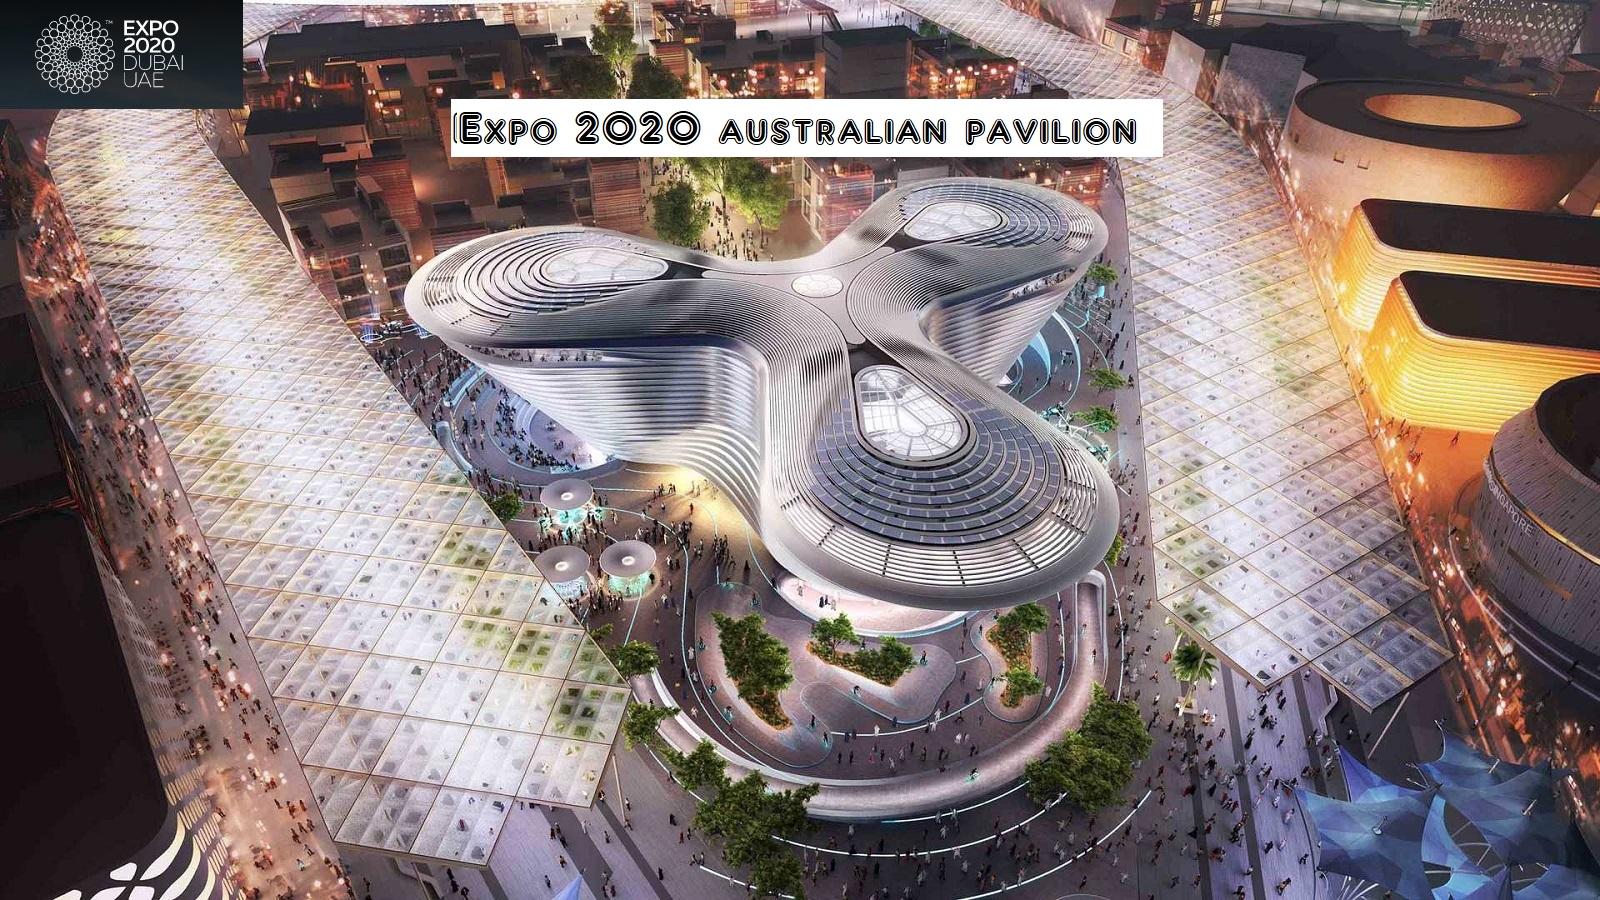 Expo 2020 Pavillions